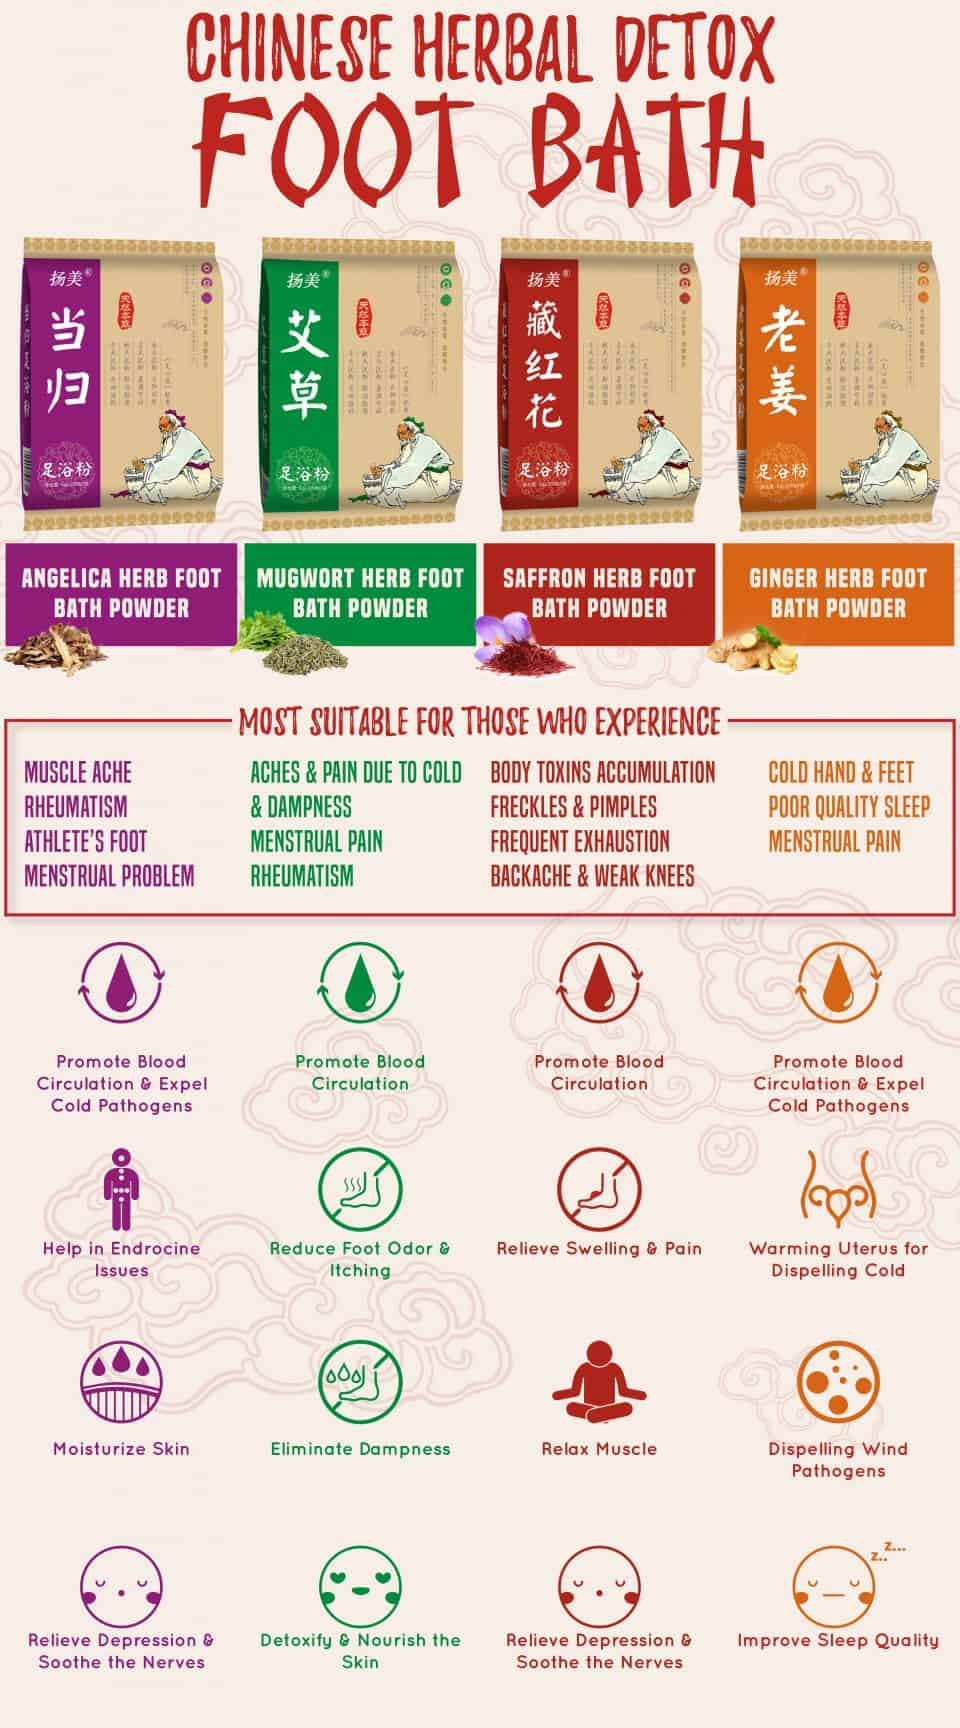 Chinese Herbal Detox FootBath Footspa Powder Sachet - Overview